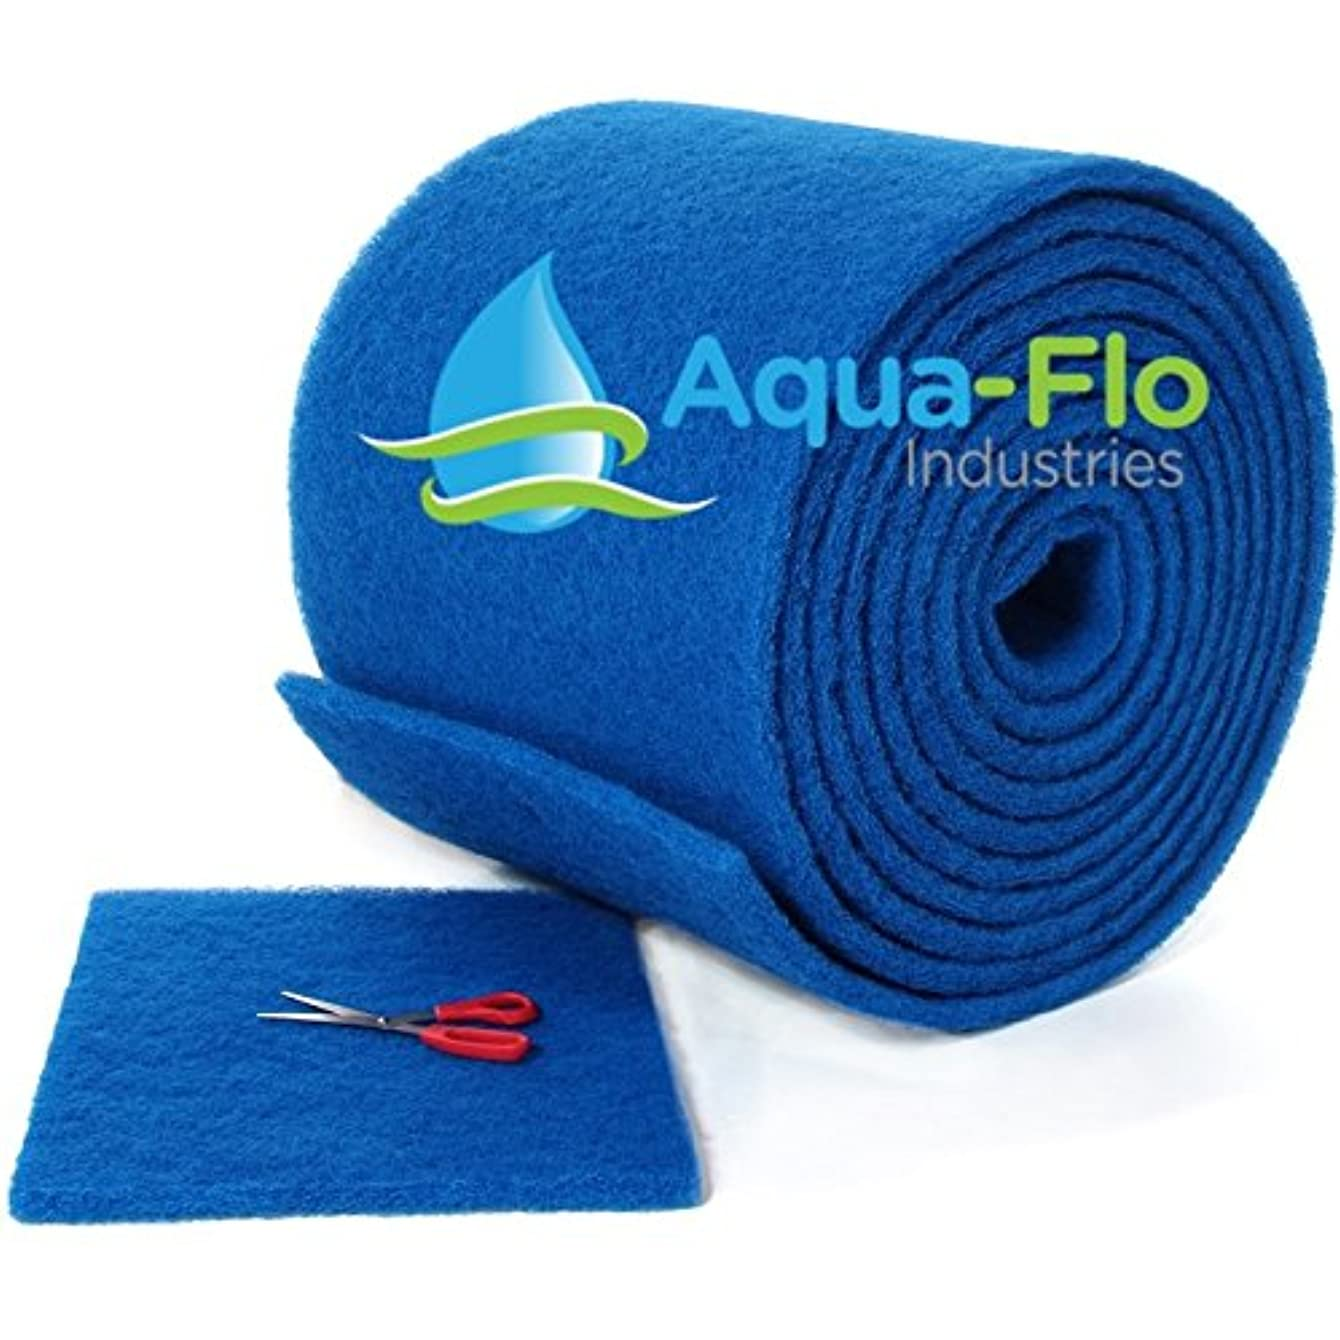 Aqua-Flo Cut to Fit AC / Furnace Preimum Washable Filter (20